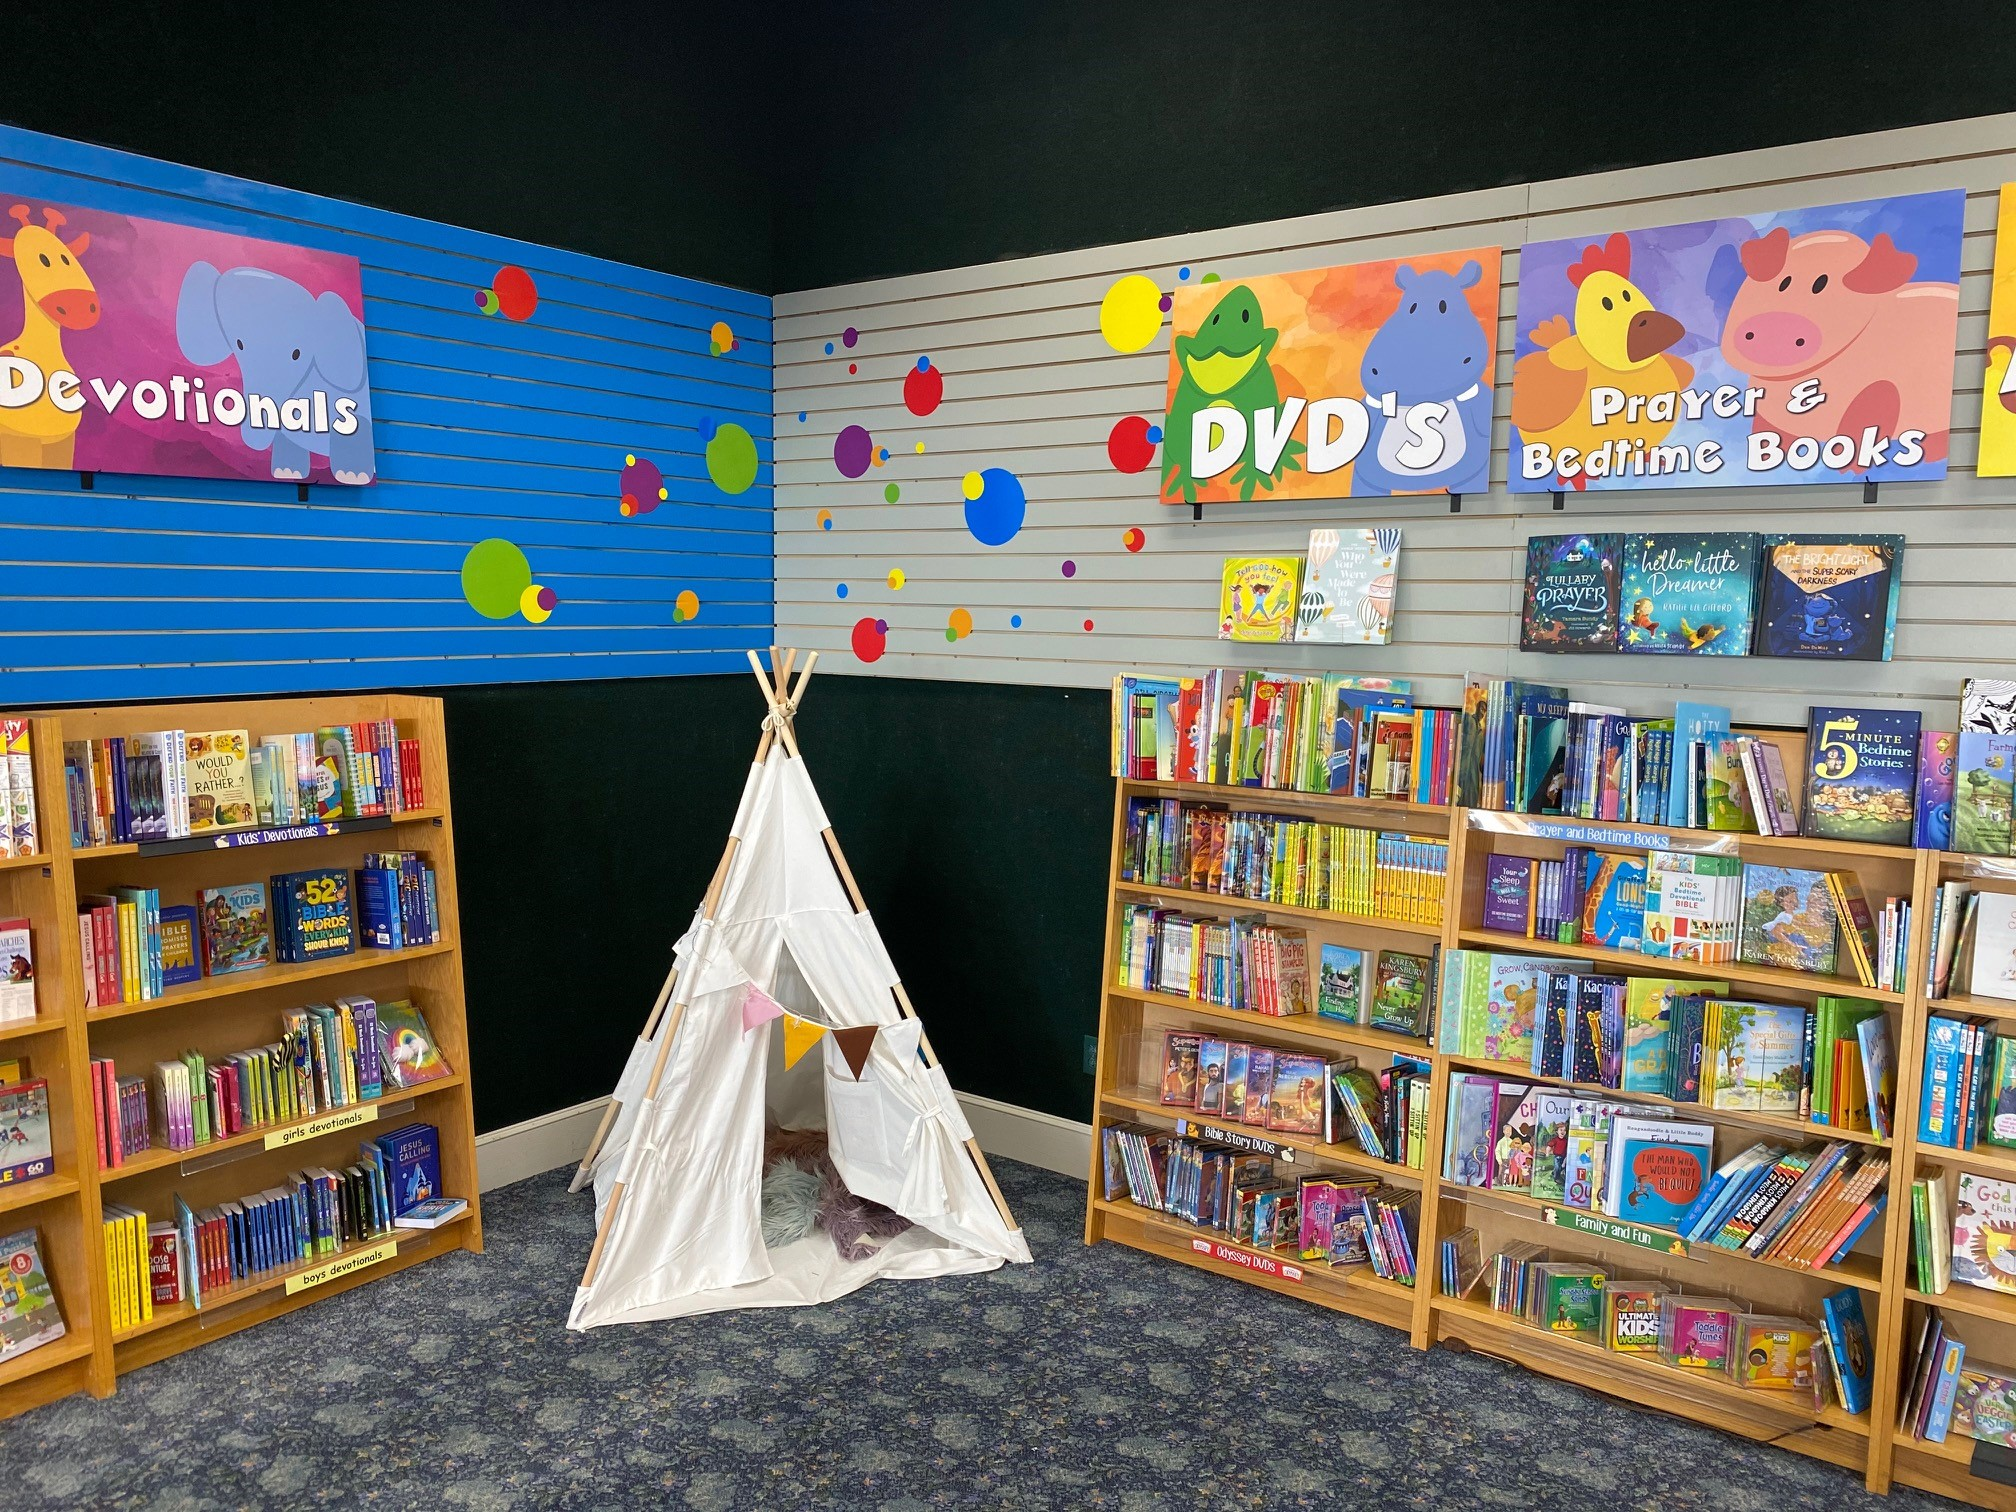 Children's Department Kids Books - Daltons Christian Books